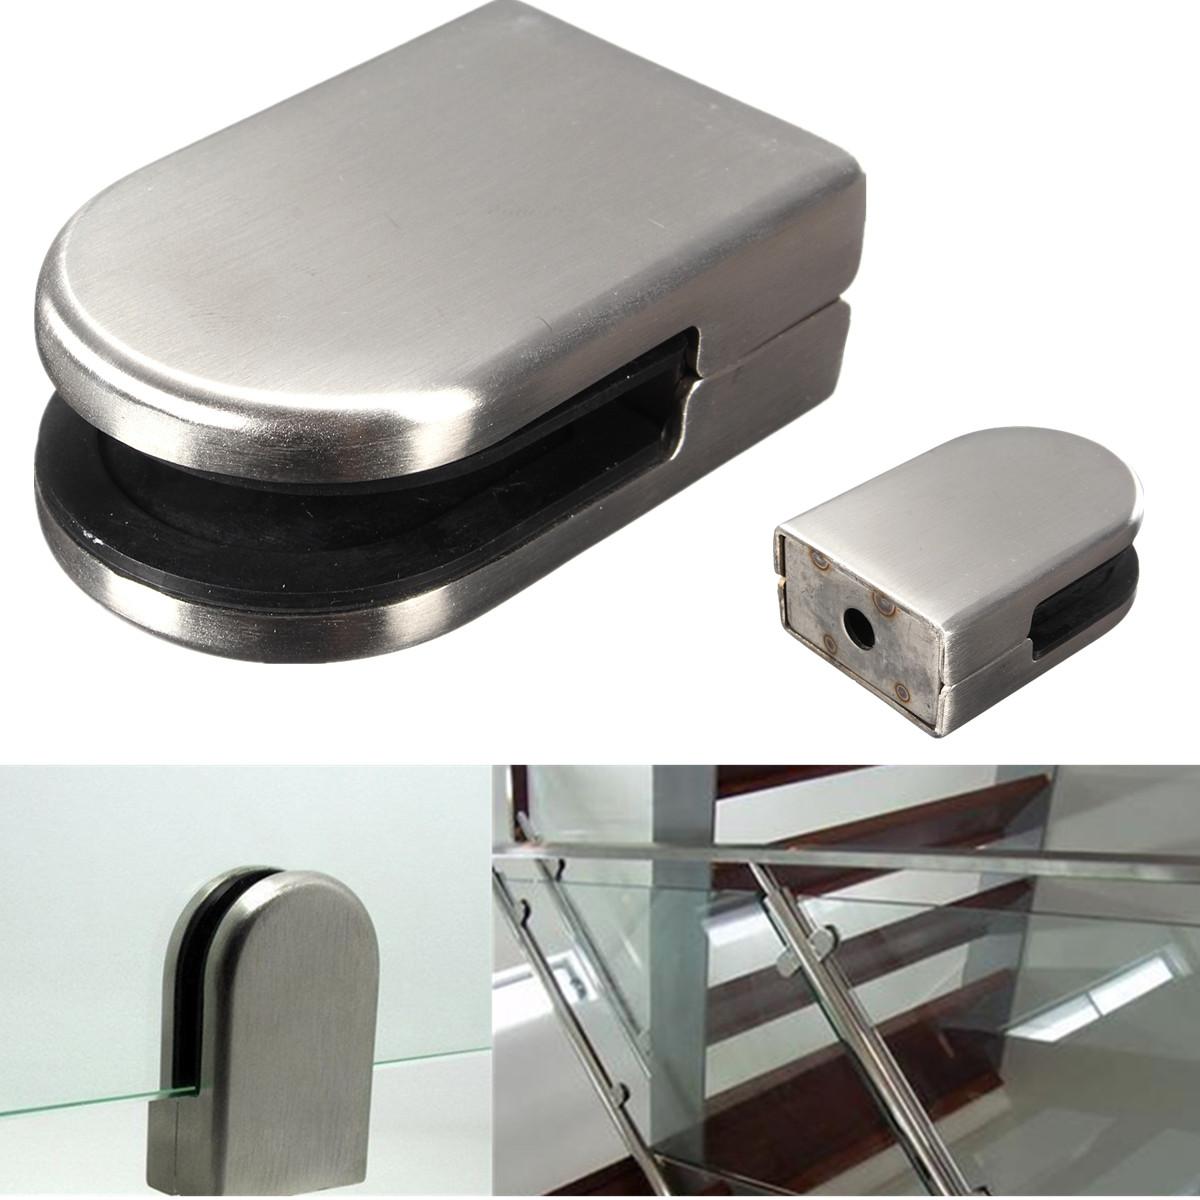 Mm stainless steel glass clamp bracket holder for